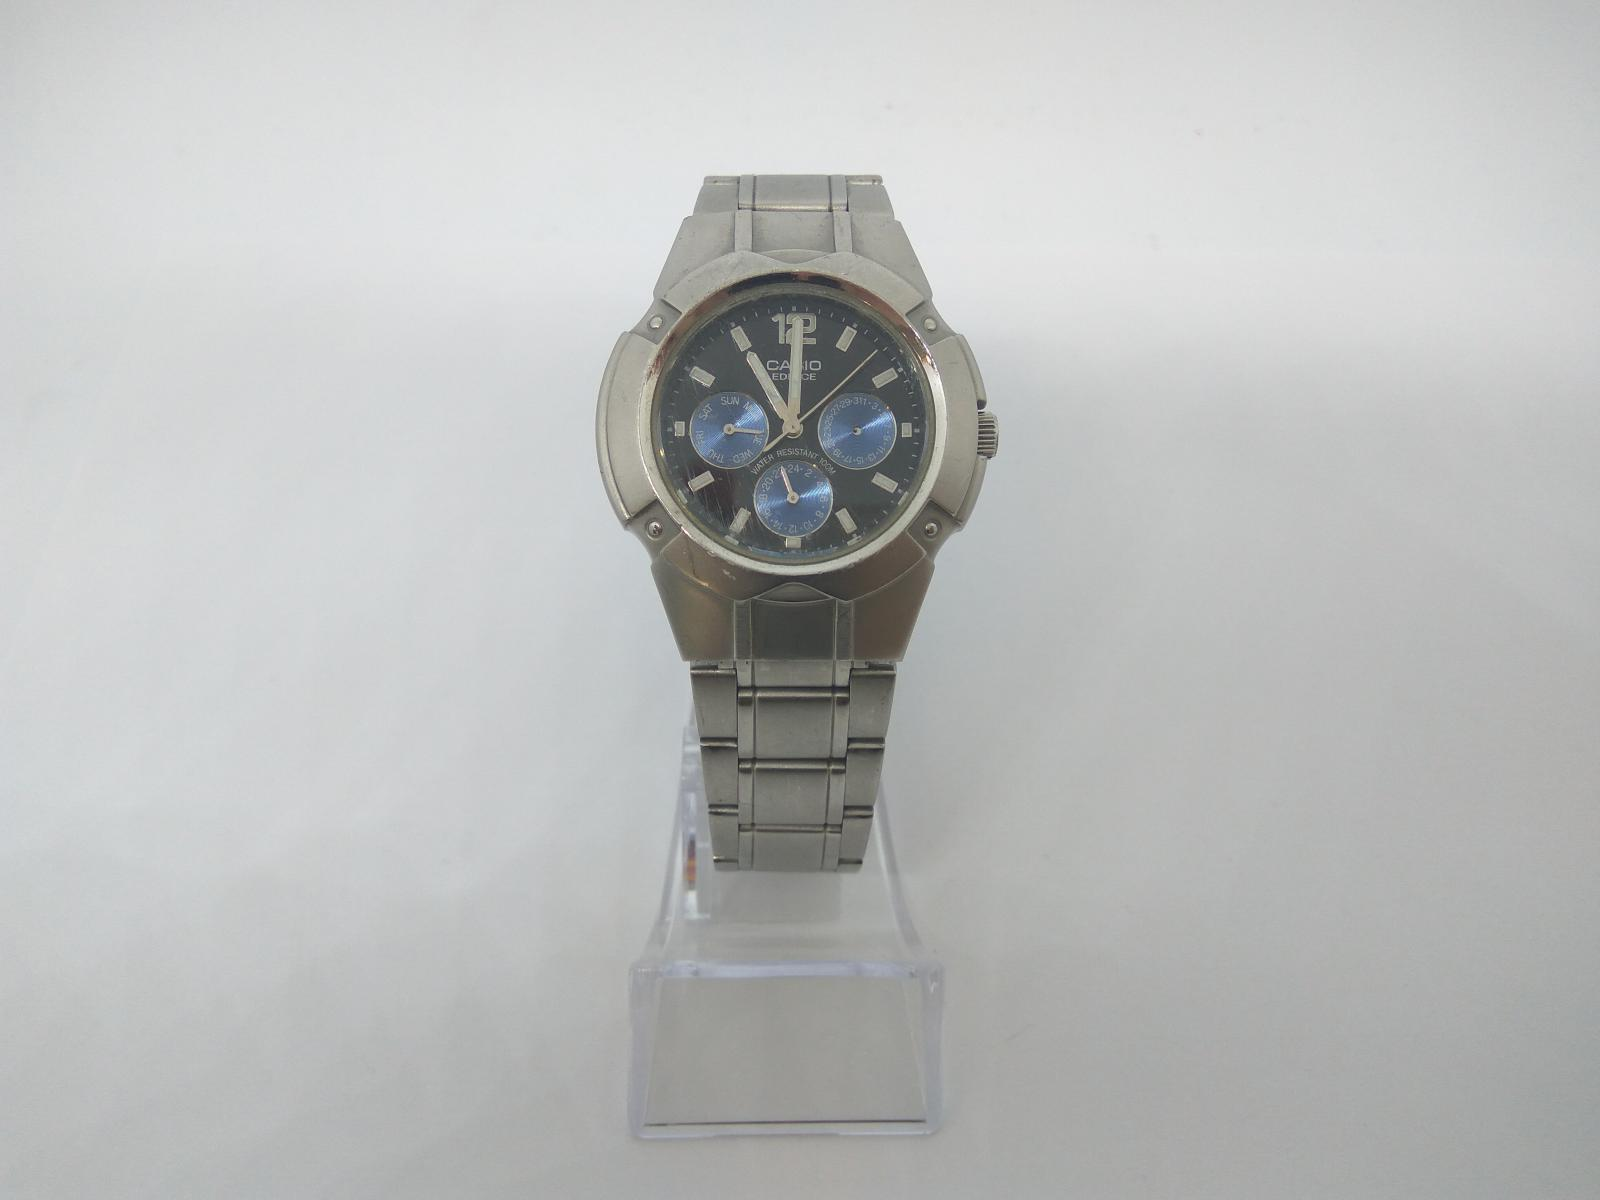 Reloj Casio Edifice 303 R Ediface 303l Fotos